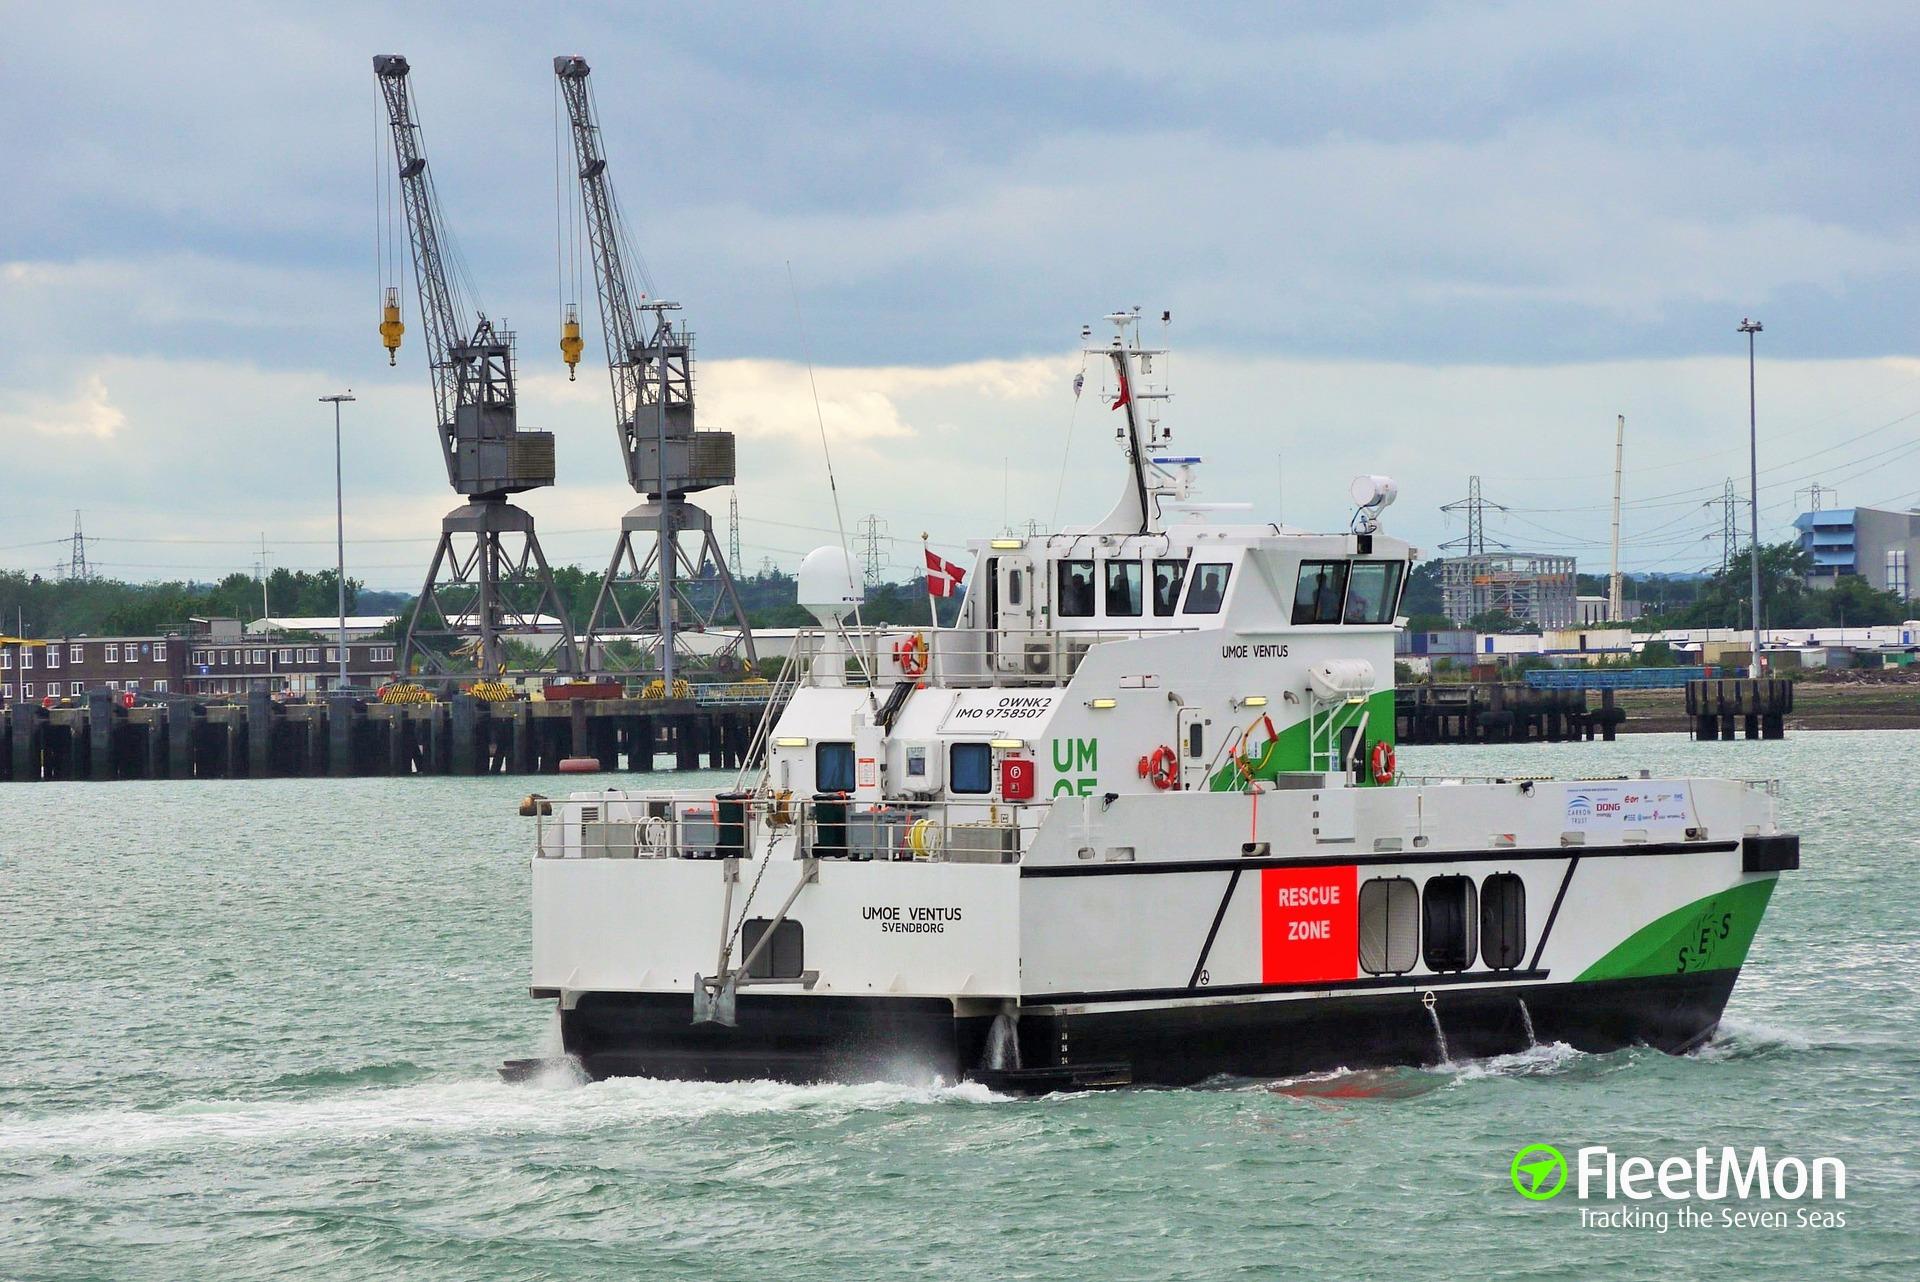 Offshore high speed craft UMOE VENTUS fire